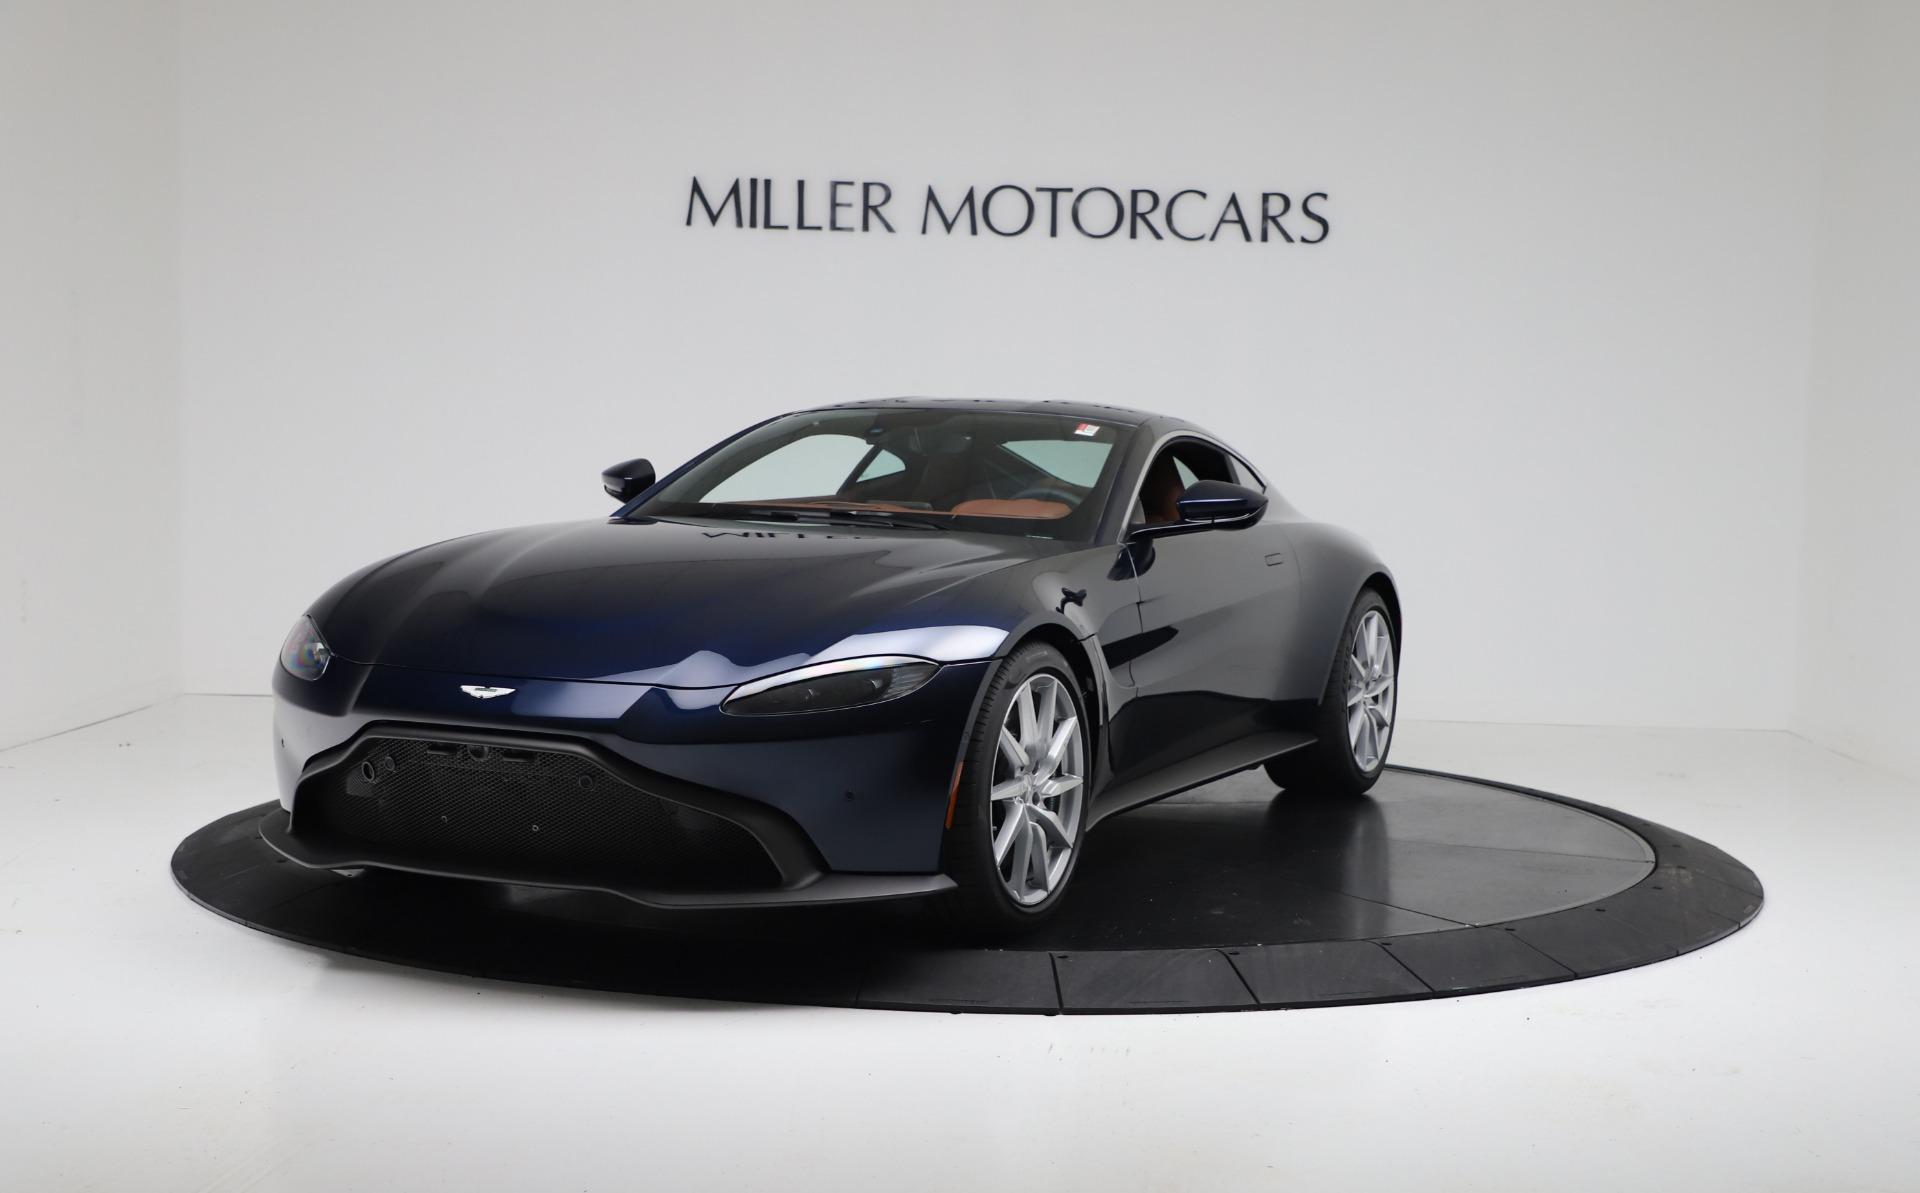 New 2020 Aston Martin Vantage V8 For Sale In Greenwich, CT 3378_p2